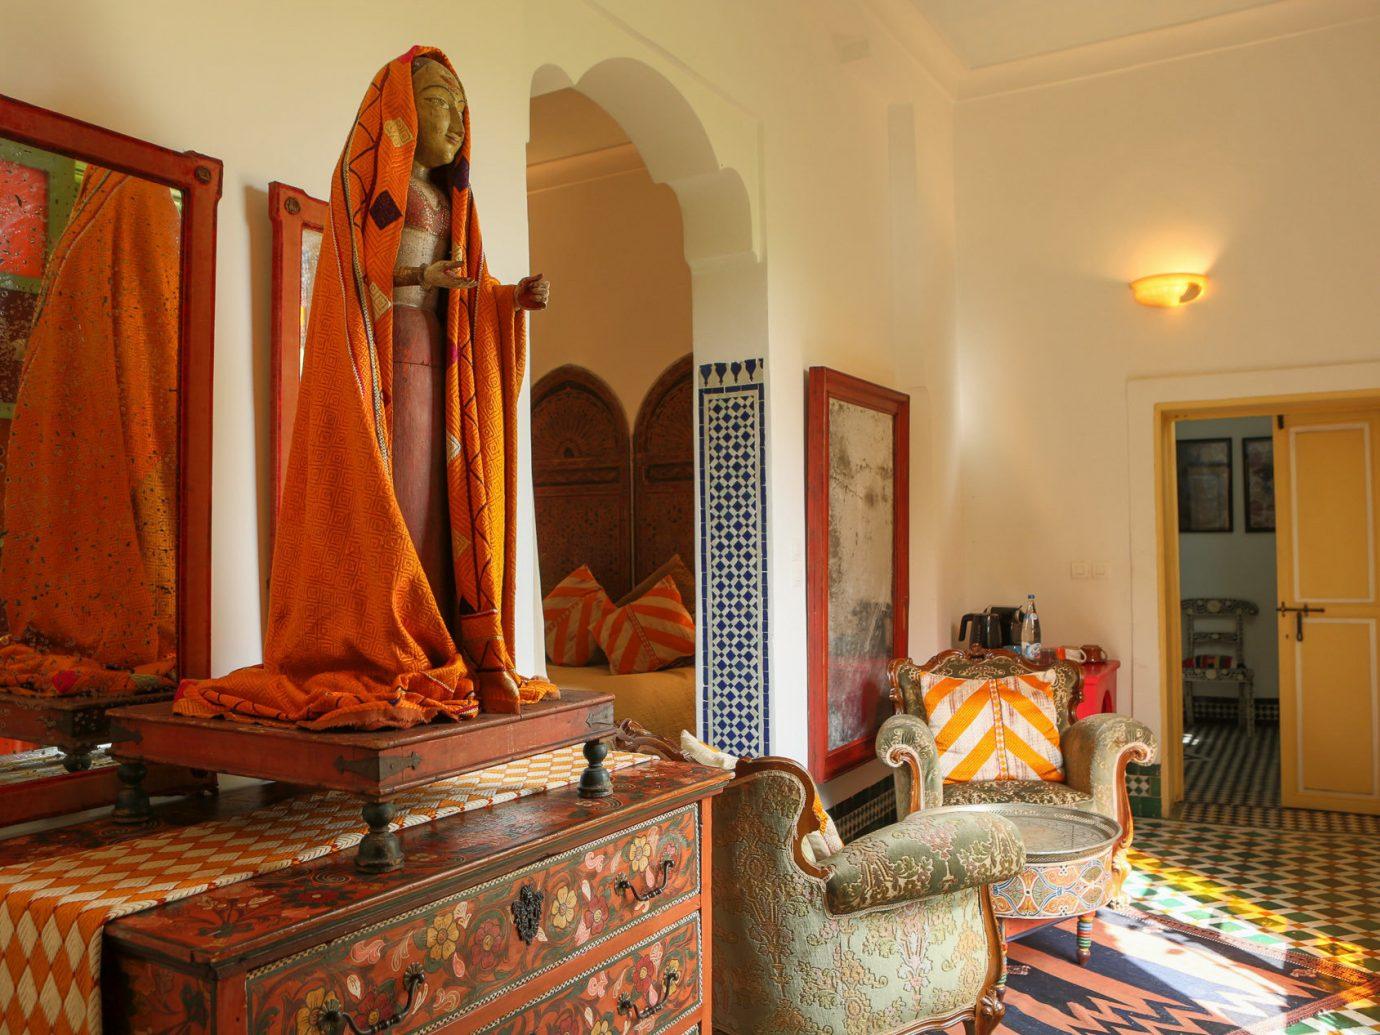 Hotels indoor wall room Living property building estate living room interior design home mansion furniture Villa Suite decorated Bedroom